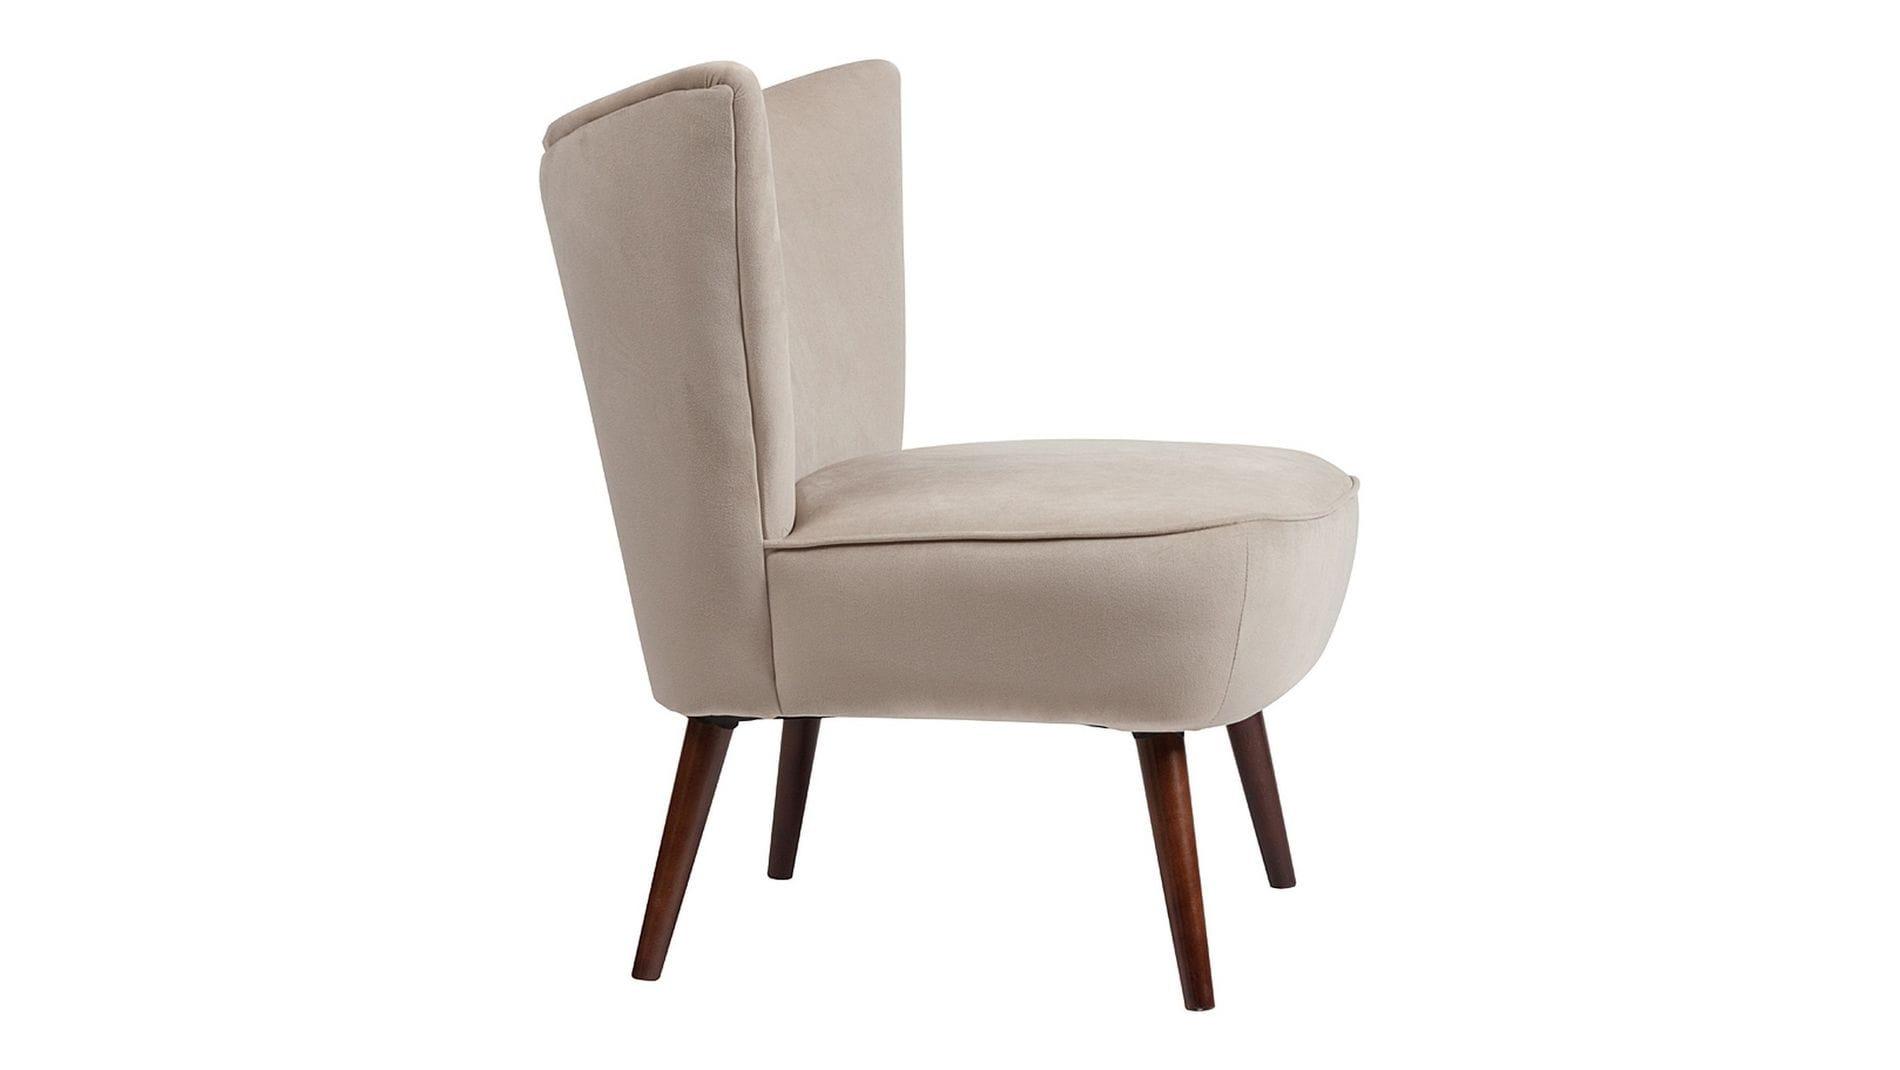 Кресло Vermont Chair Серо-Бежевый Велюр Р